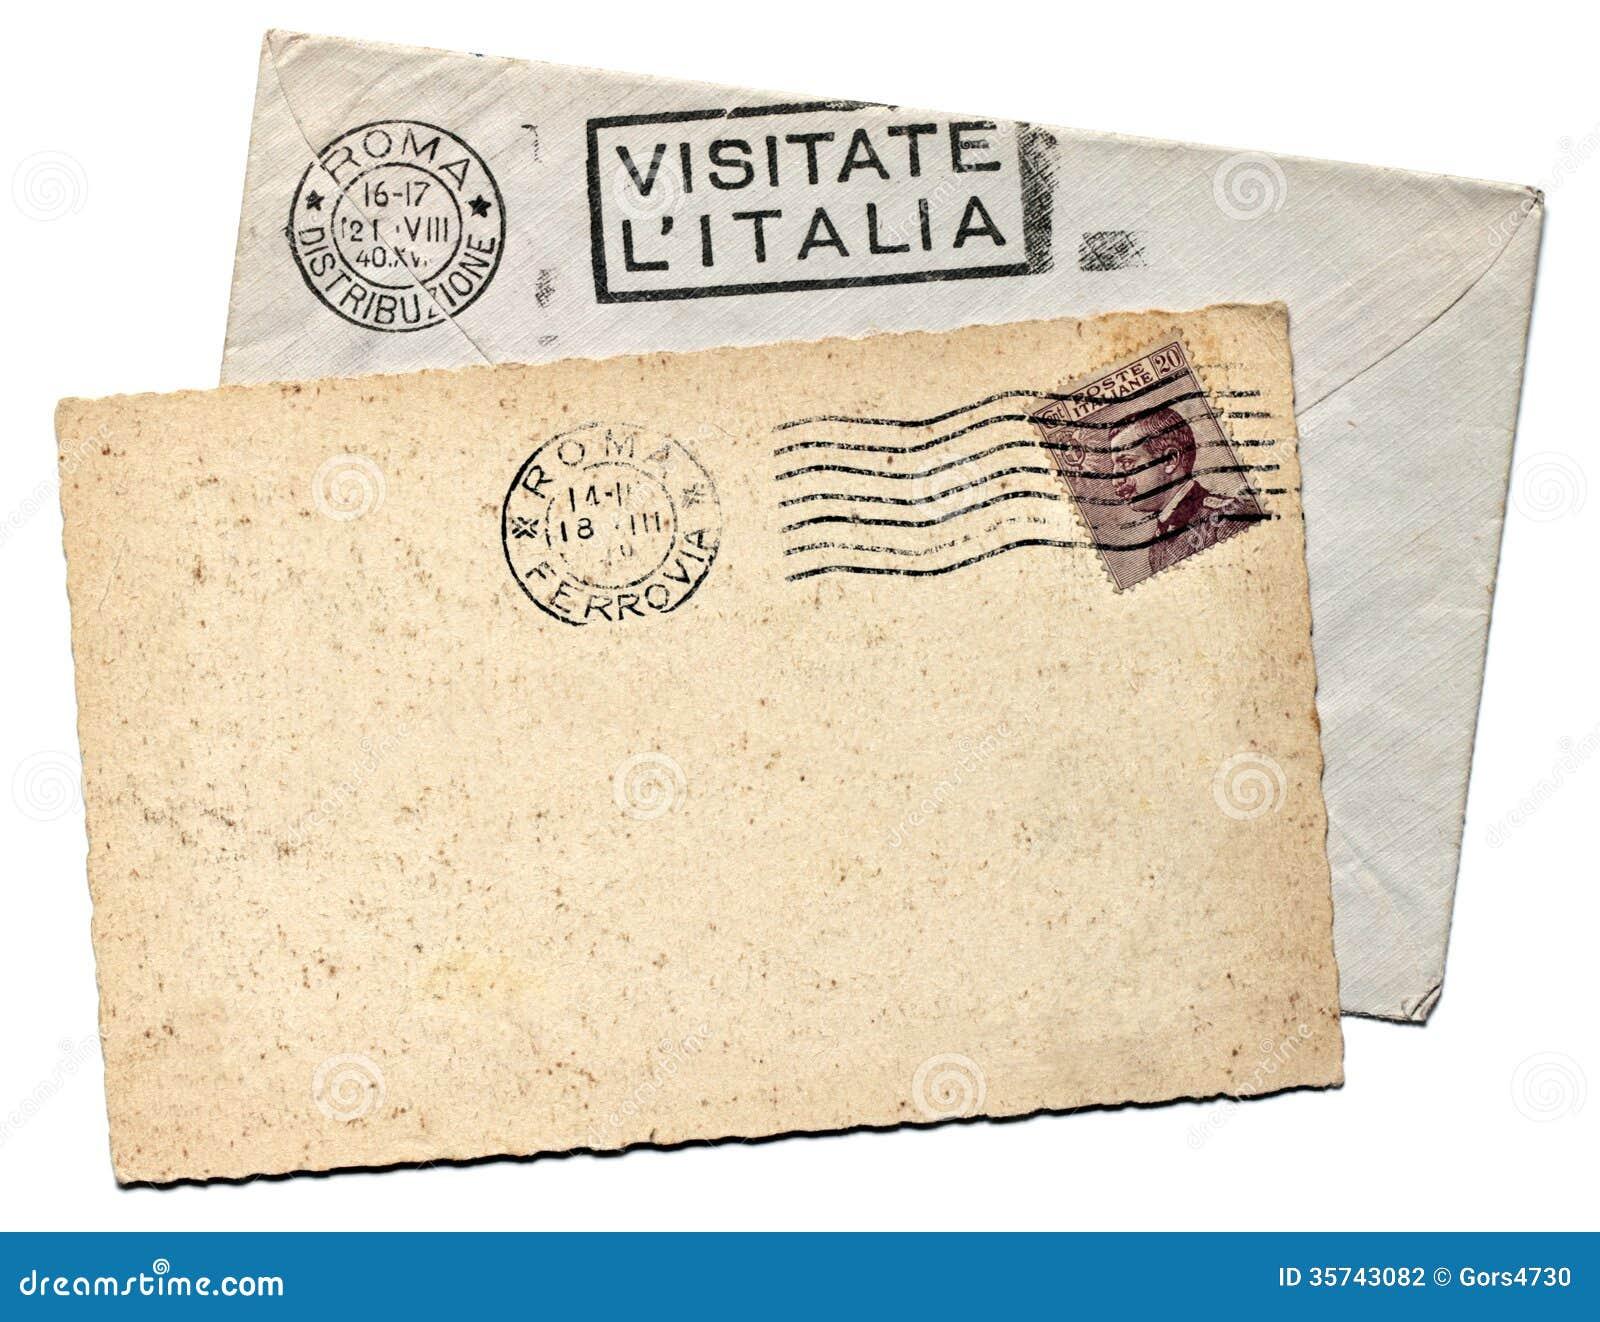 Italian handwritten postcard letter stock photo image 39254147 - Italian Postcard Stock Photography Italian Postcard Italian Handwritten Postcard Letter